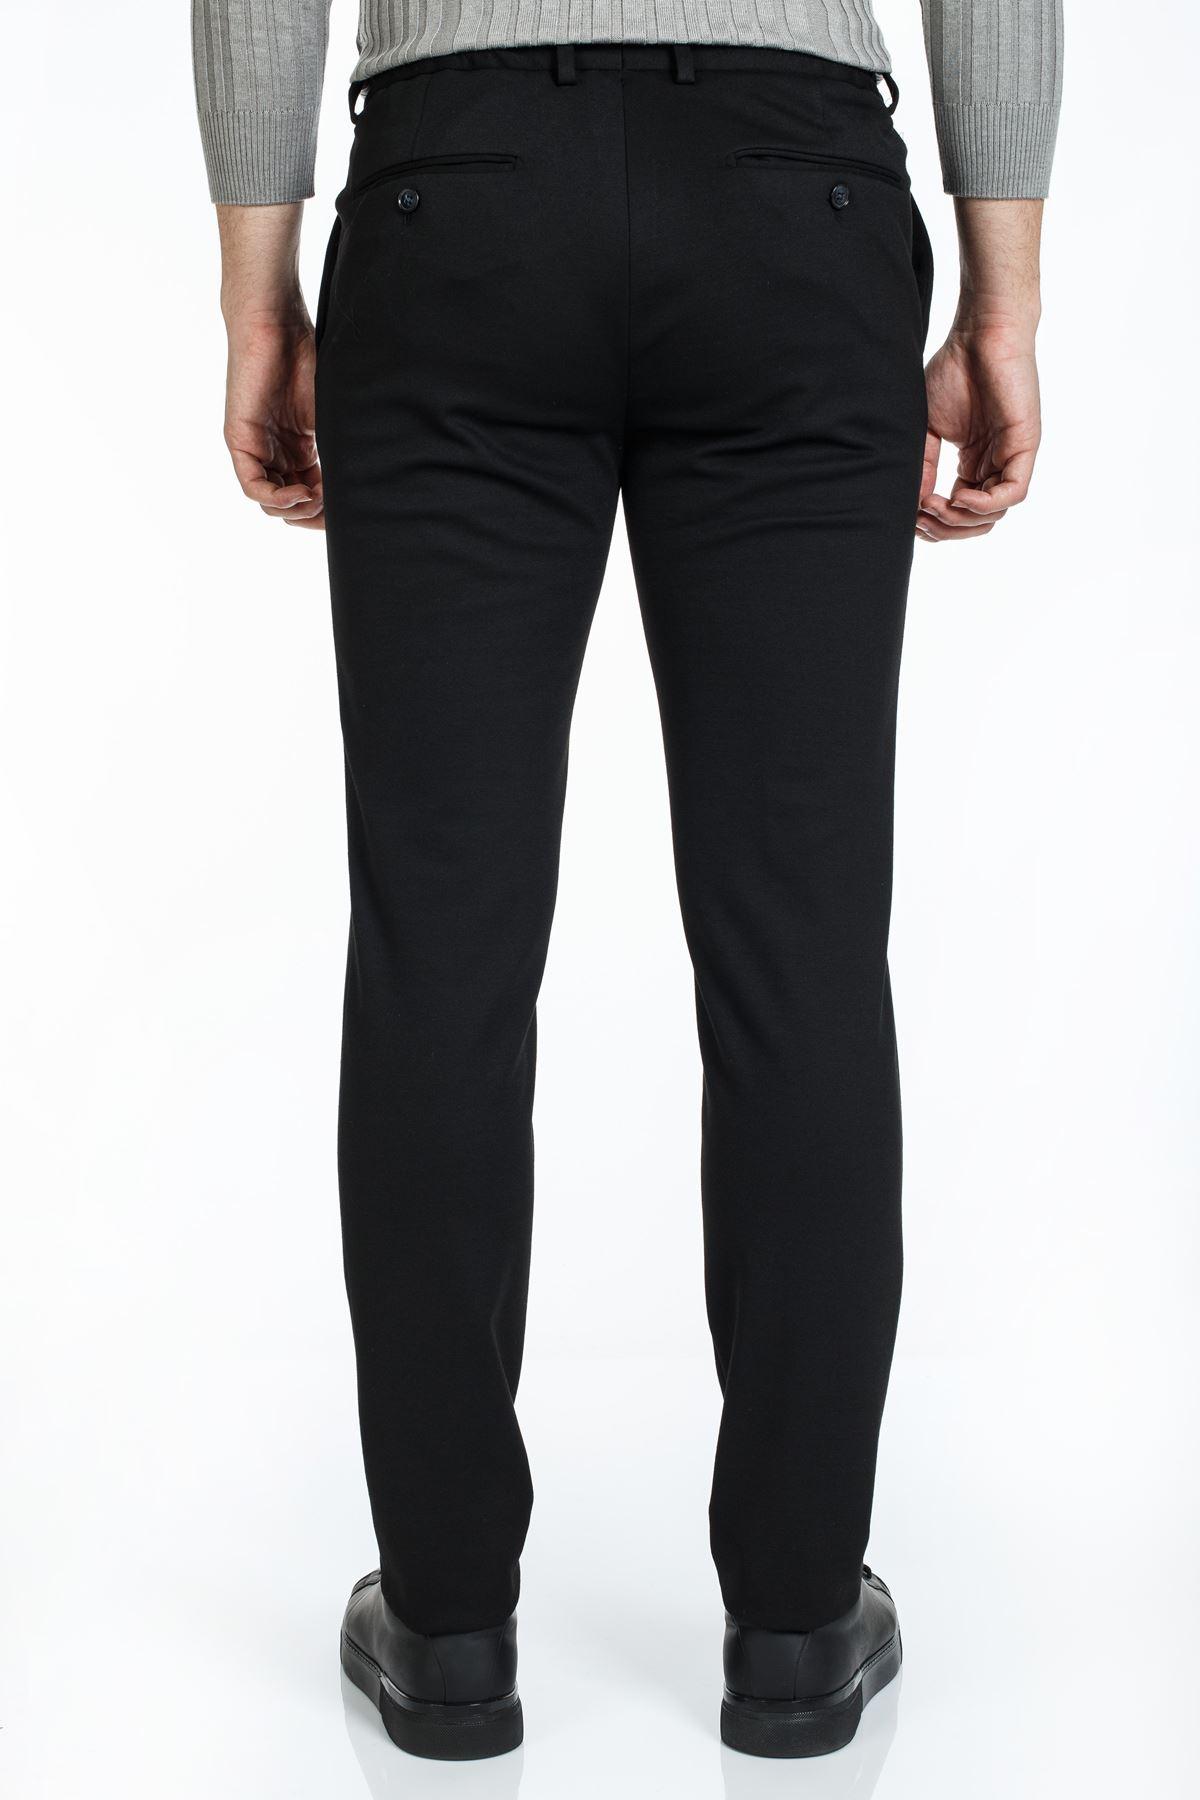 Siyah Süper Slim Kalıp Örme Jogger Pantolon